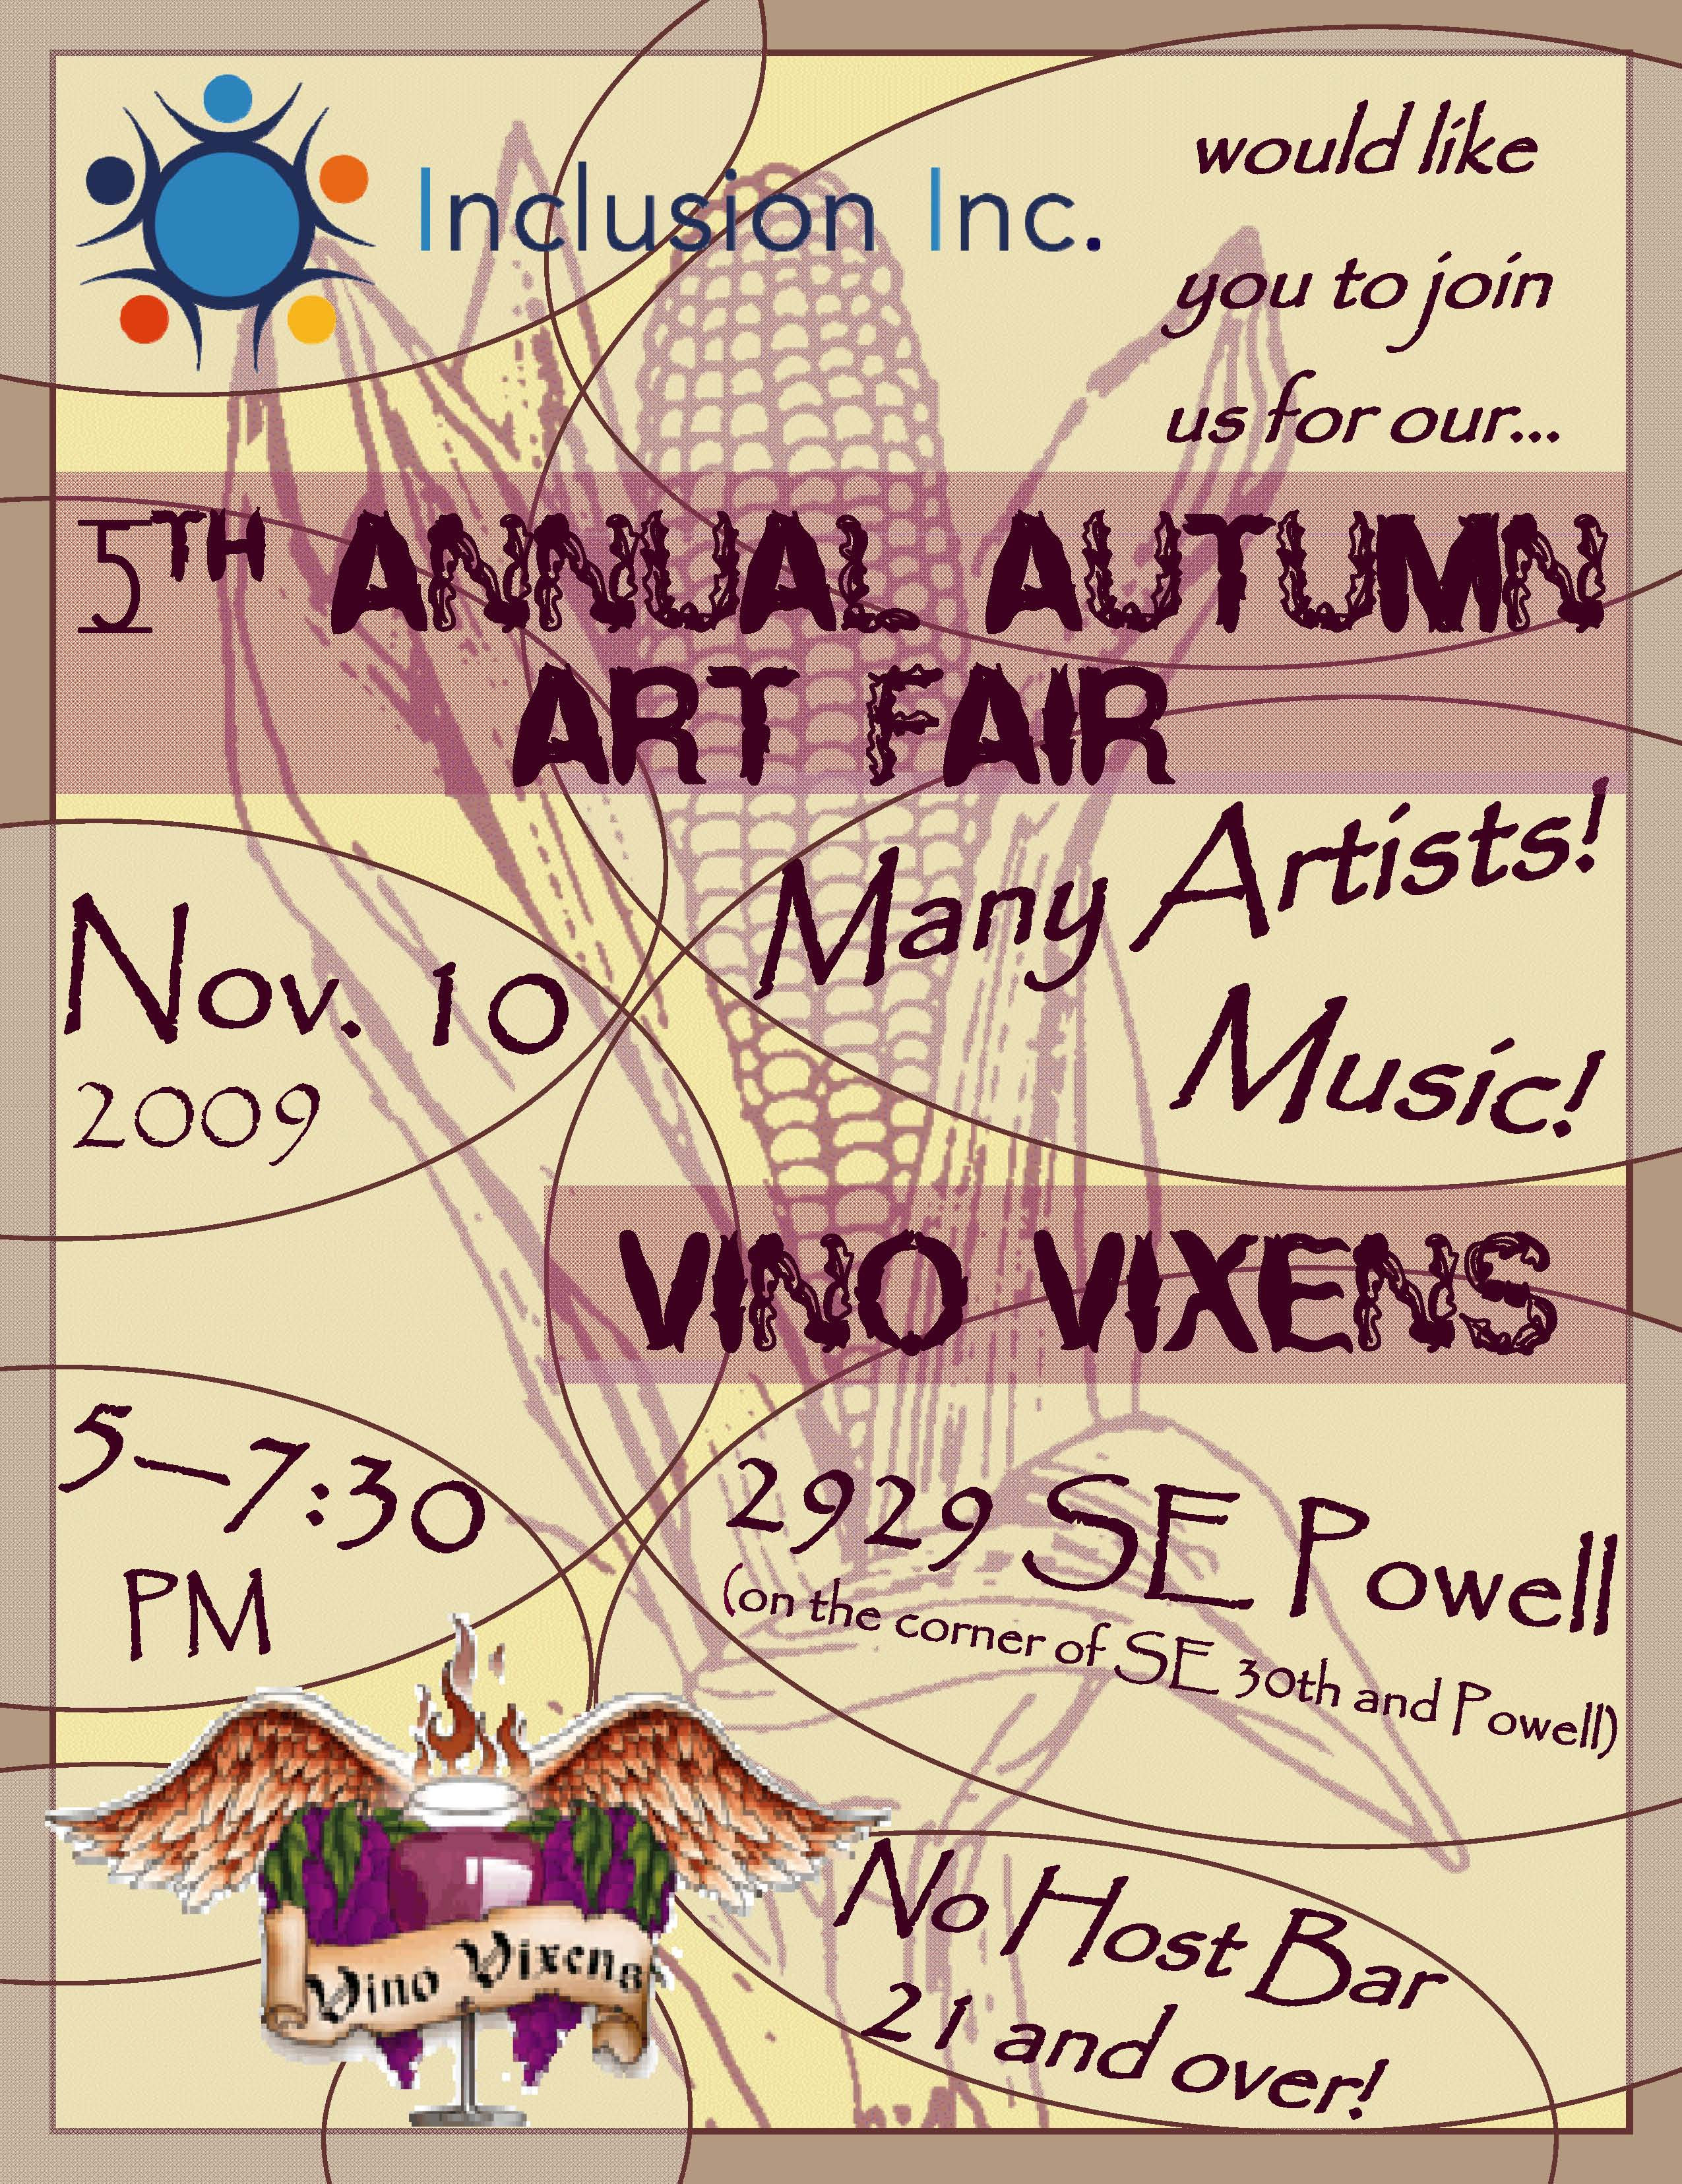 Please join us for our 5th annual Autumn Art Fair!